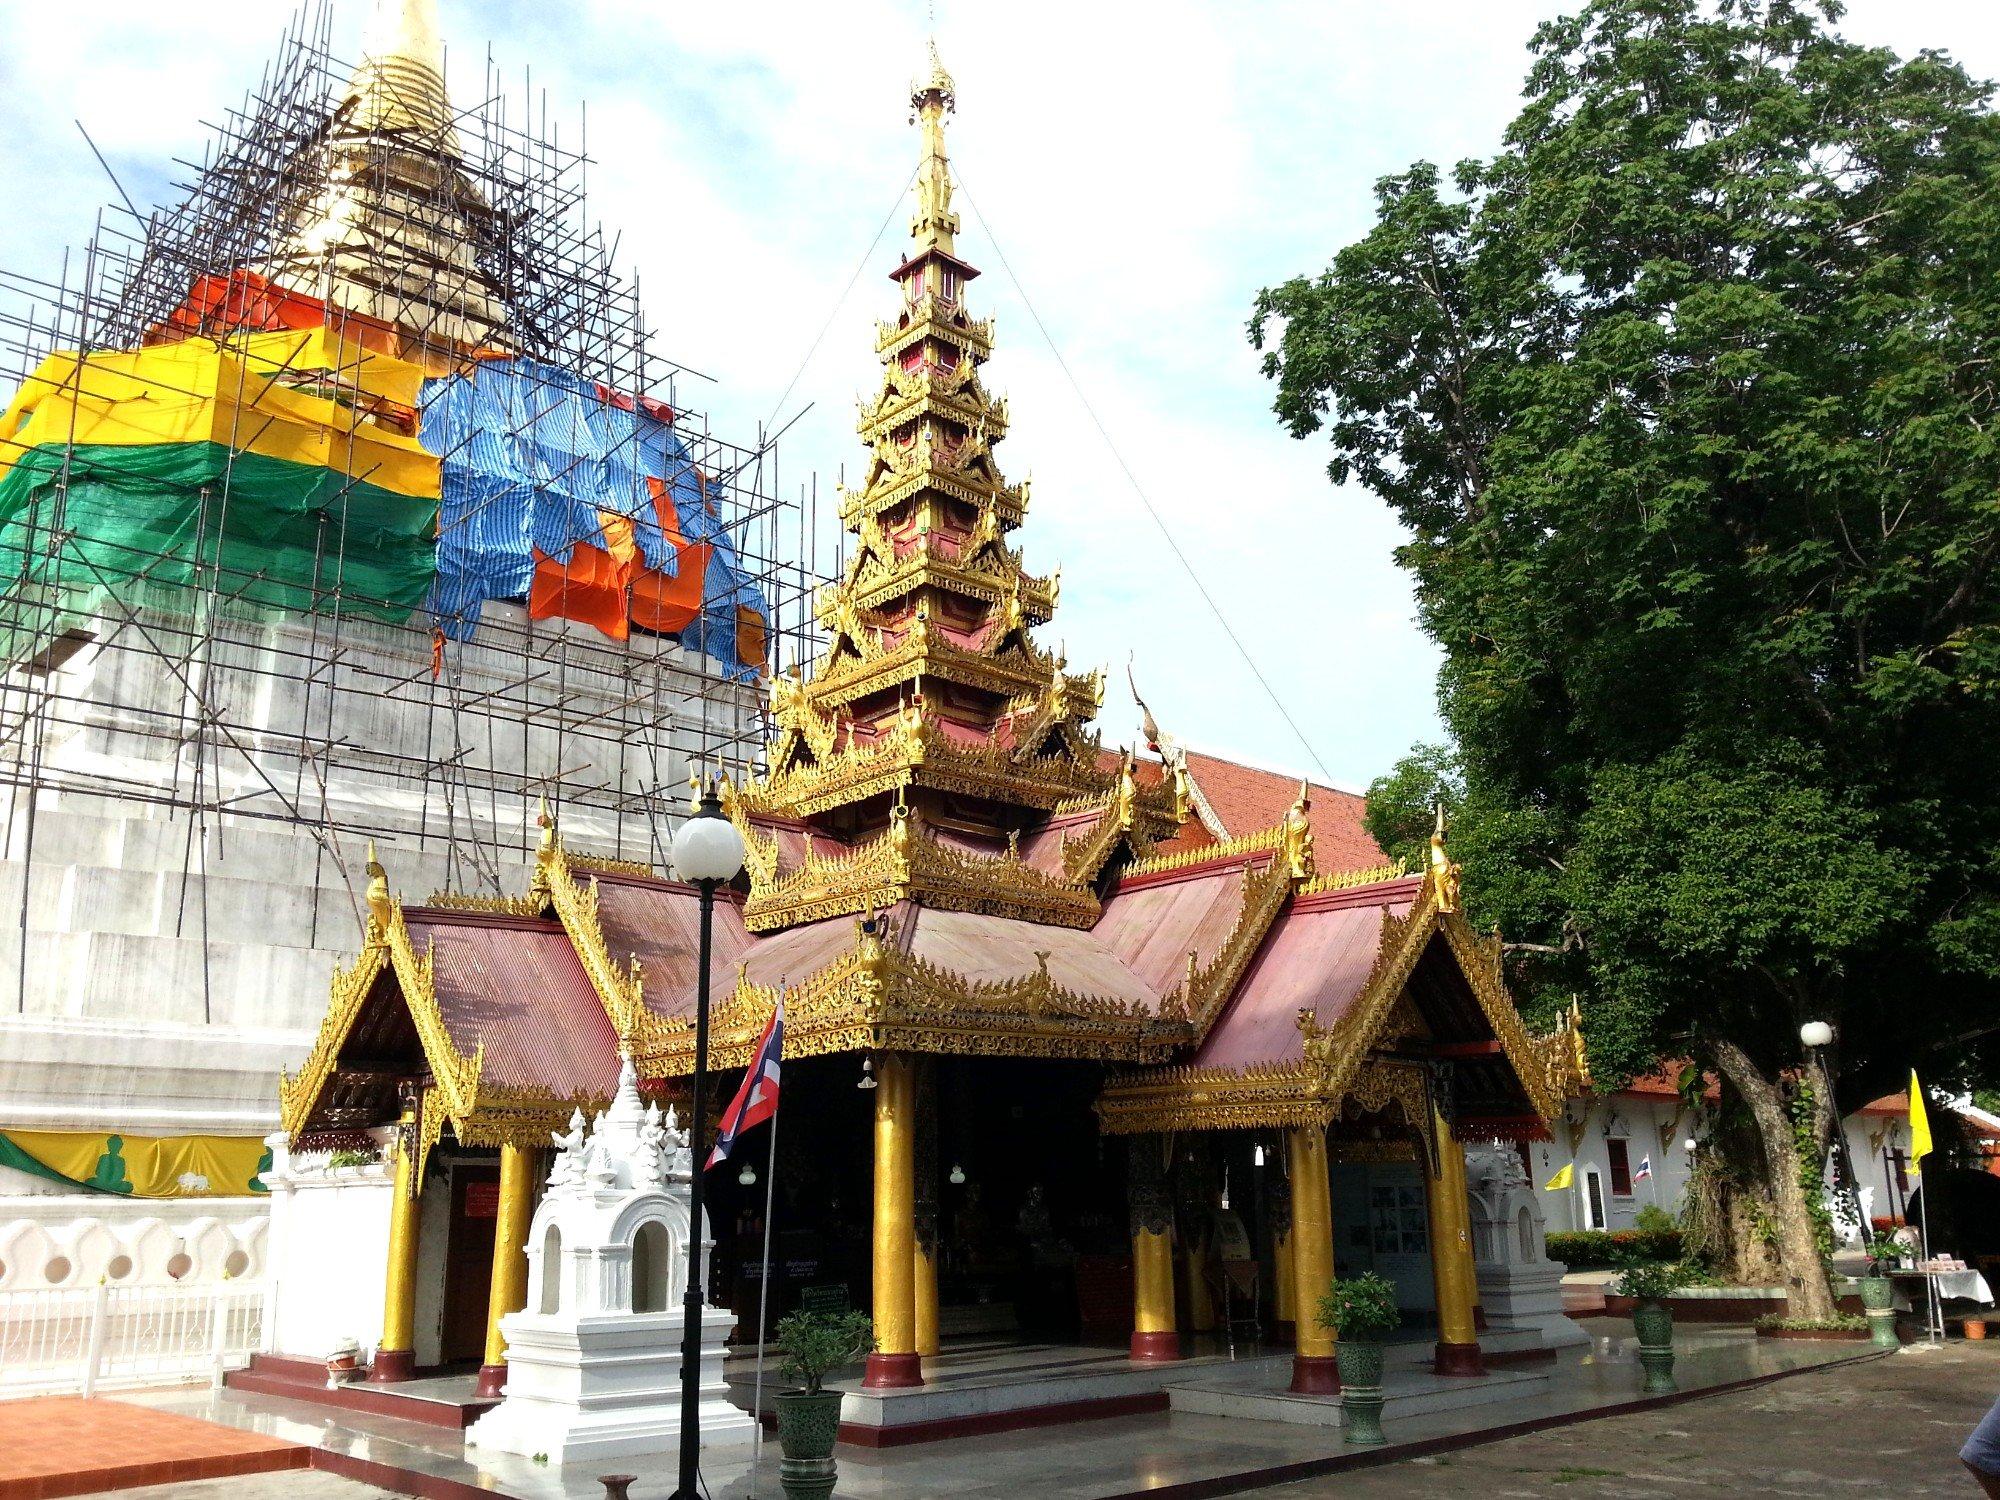 Burmese style mondop at Wat Phra Kaew Don Tao